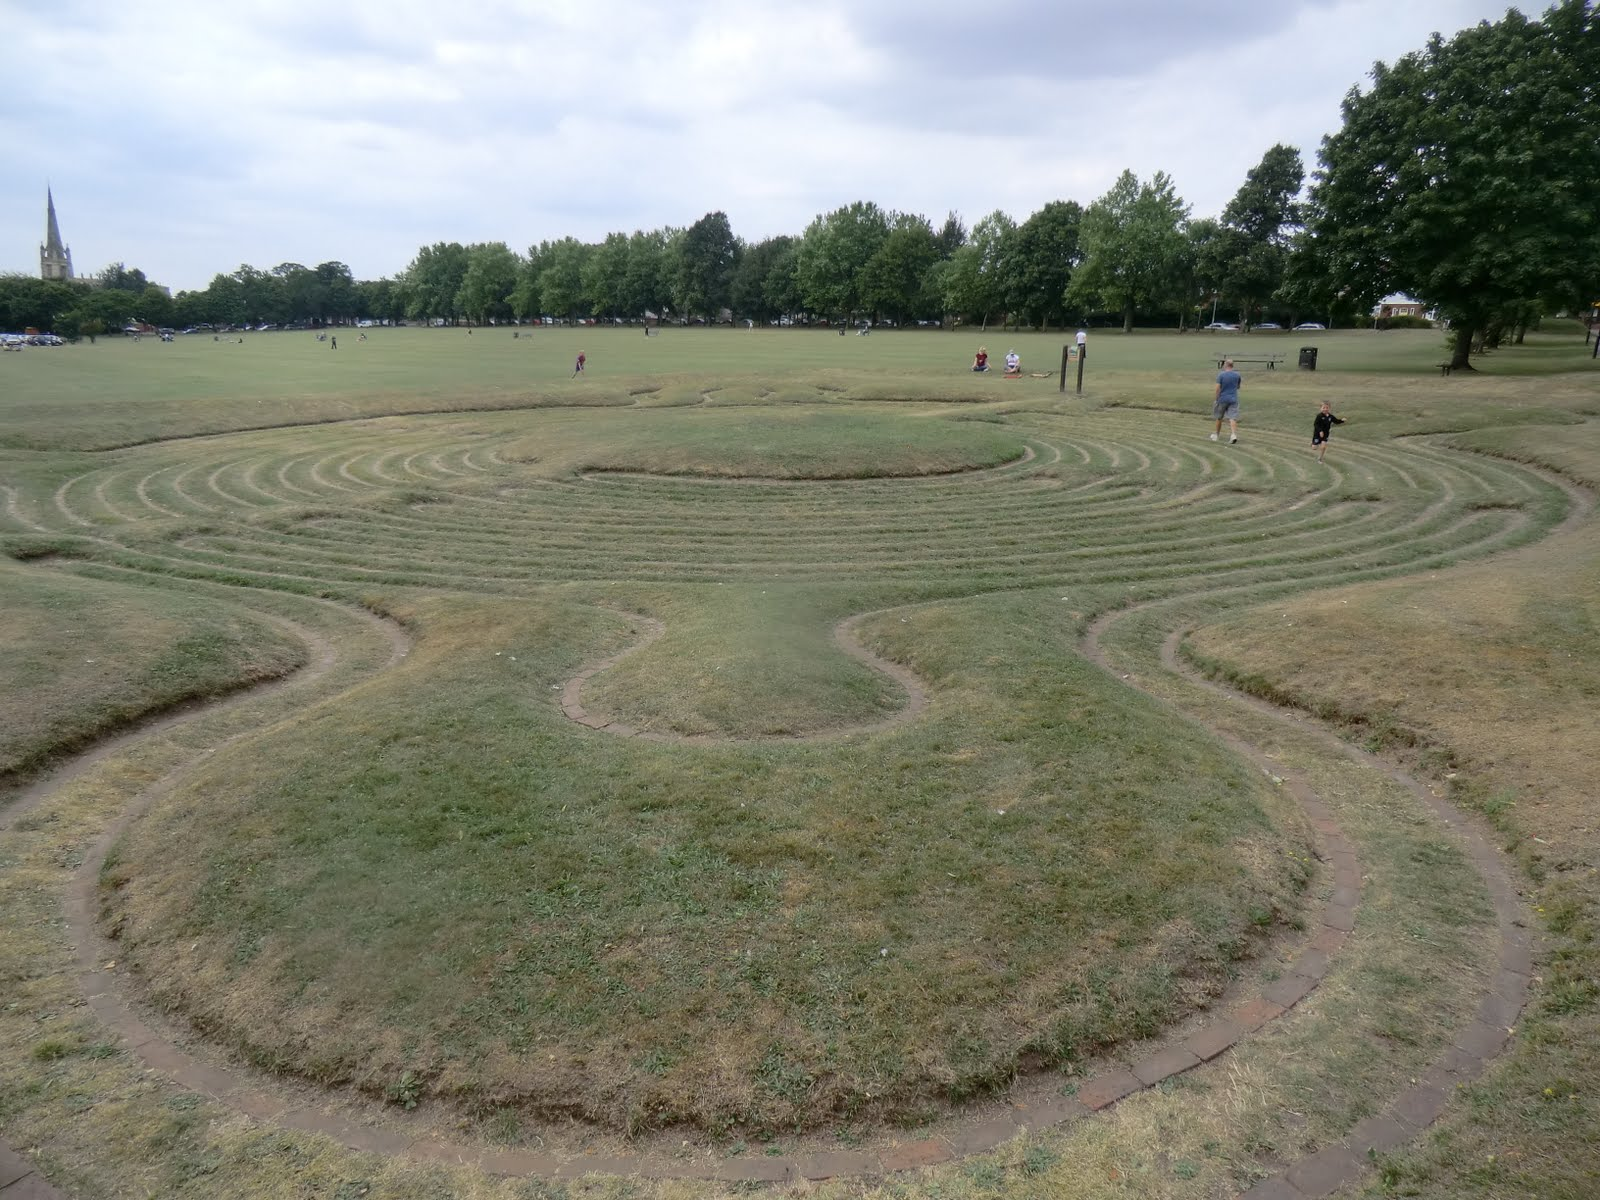 CIMG6012 Turf Labyrinth, Saffron Walden